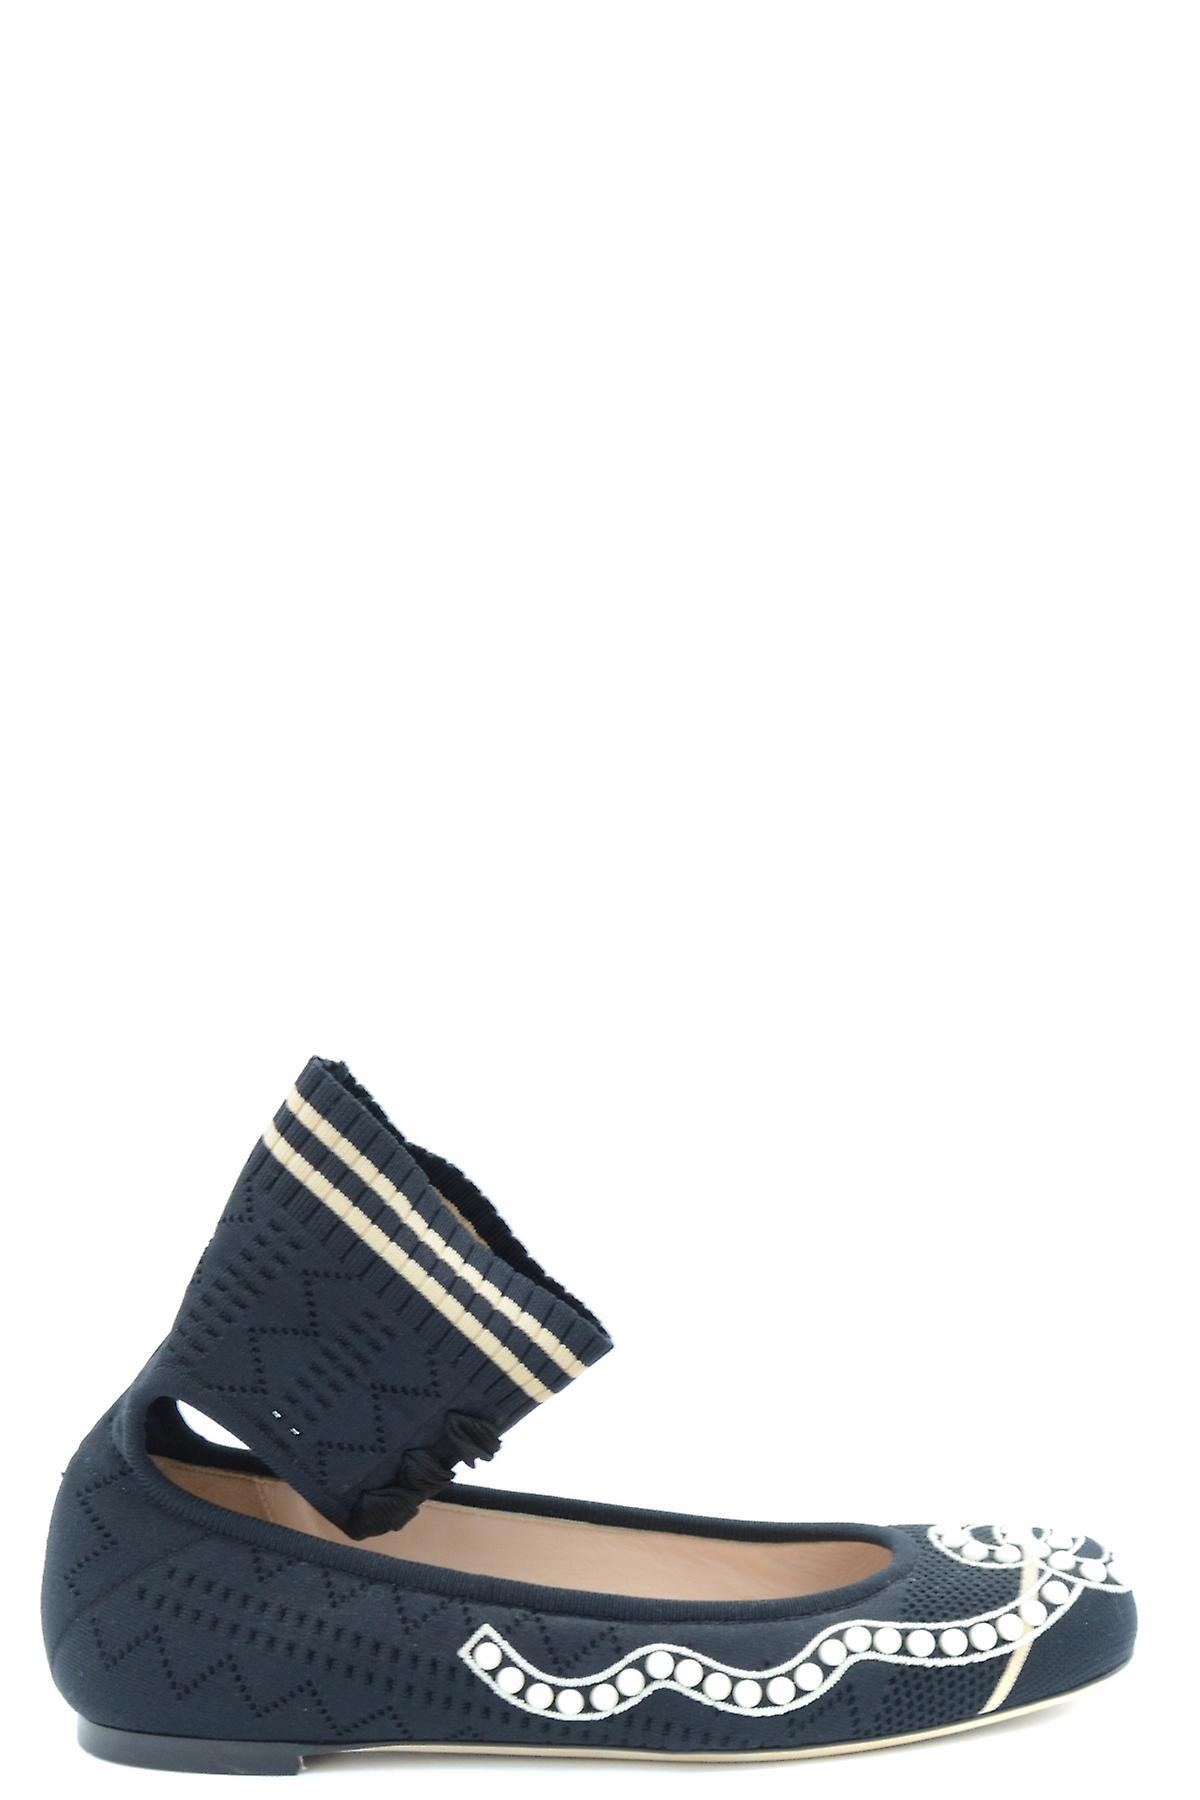 Fendi Ezbc009022 Women's Black Leather Flats